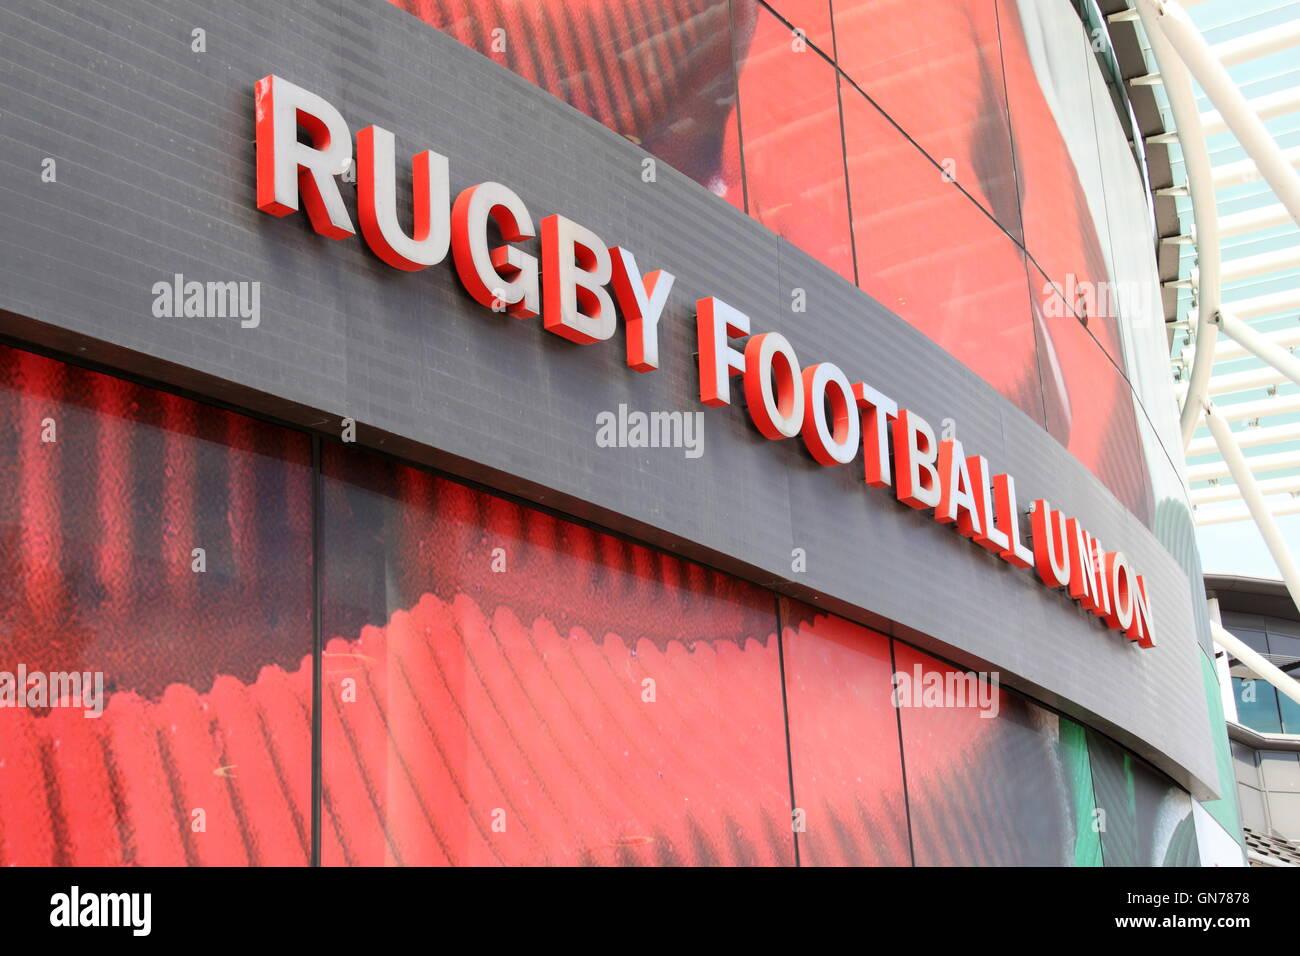 Rugby House, Twickenham Stadium, Greater London, England, Great Britain, United Kingdom UK, Europe - Stock Image